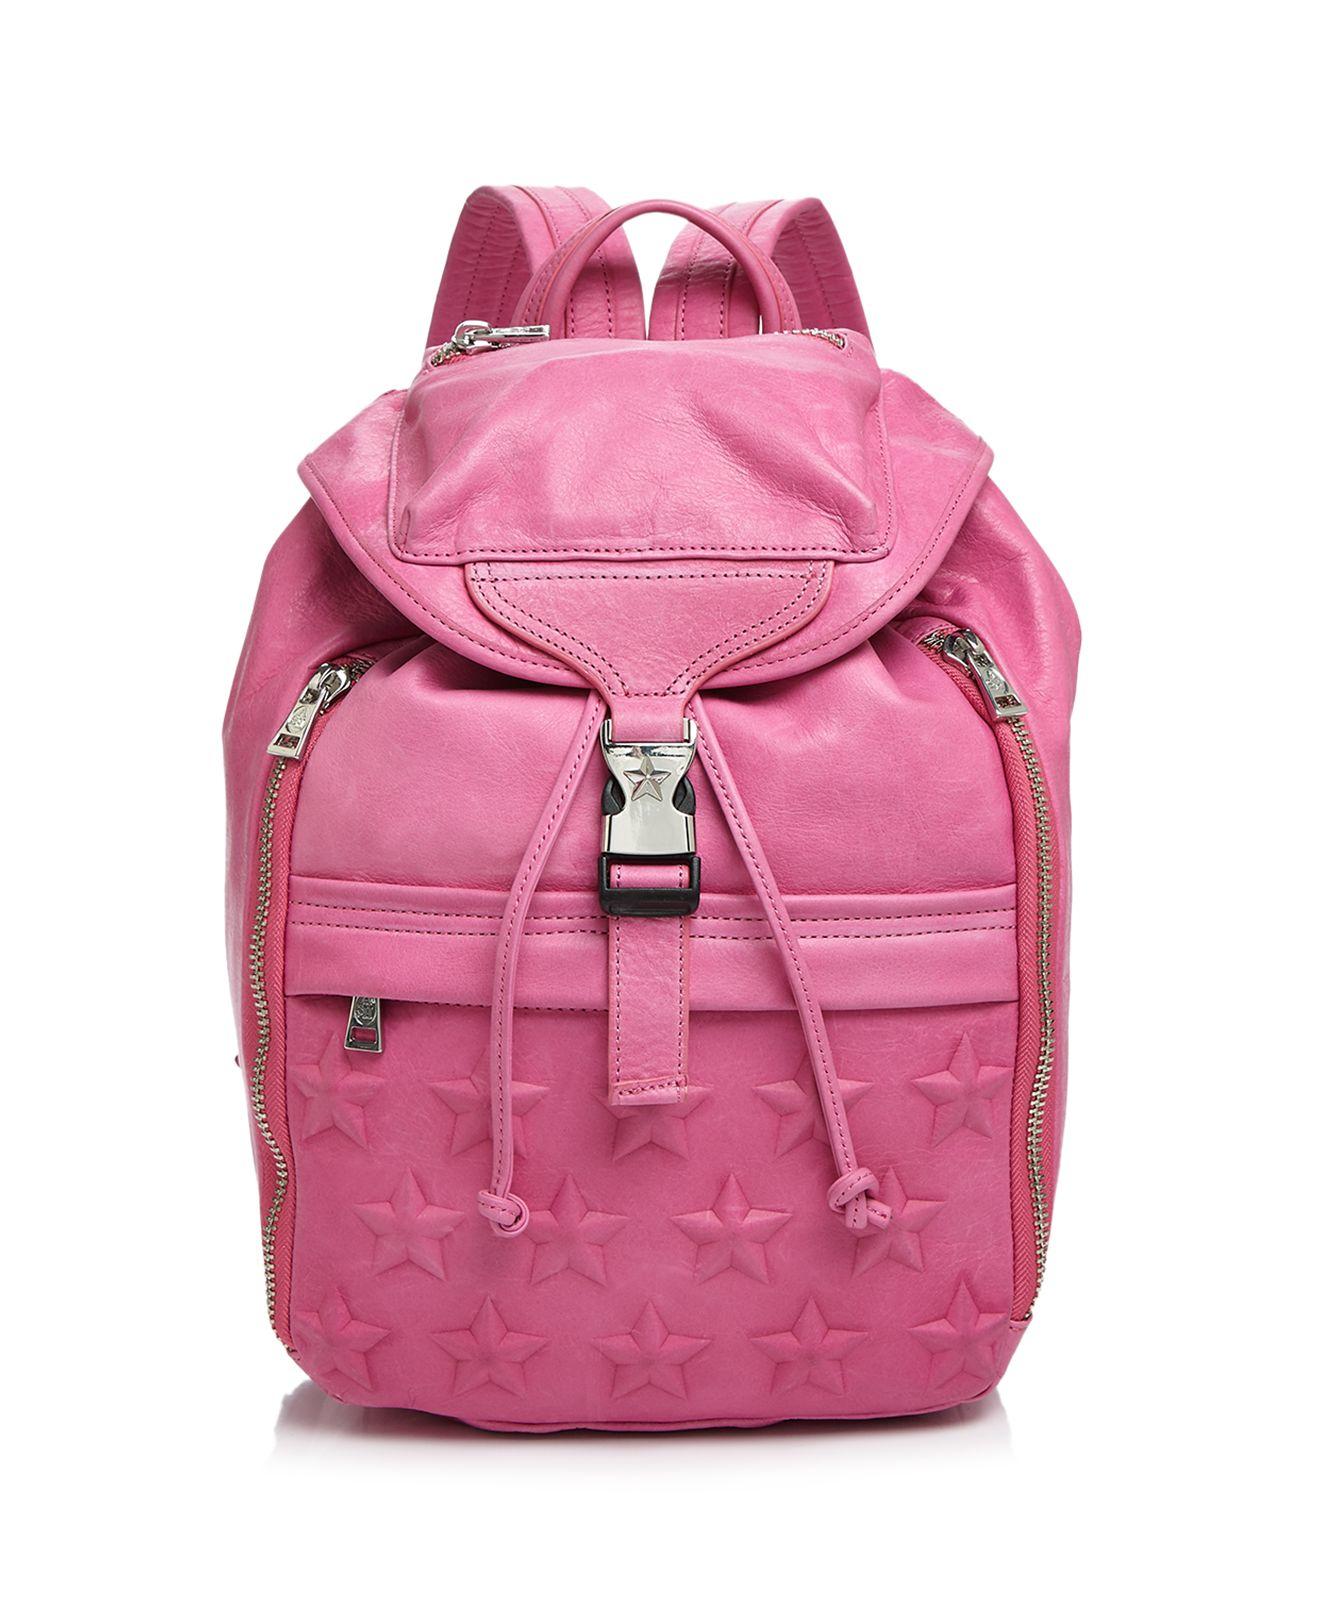 Lyst - Ash Small Jordan Backpack in Pink